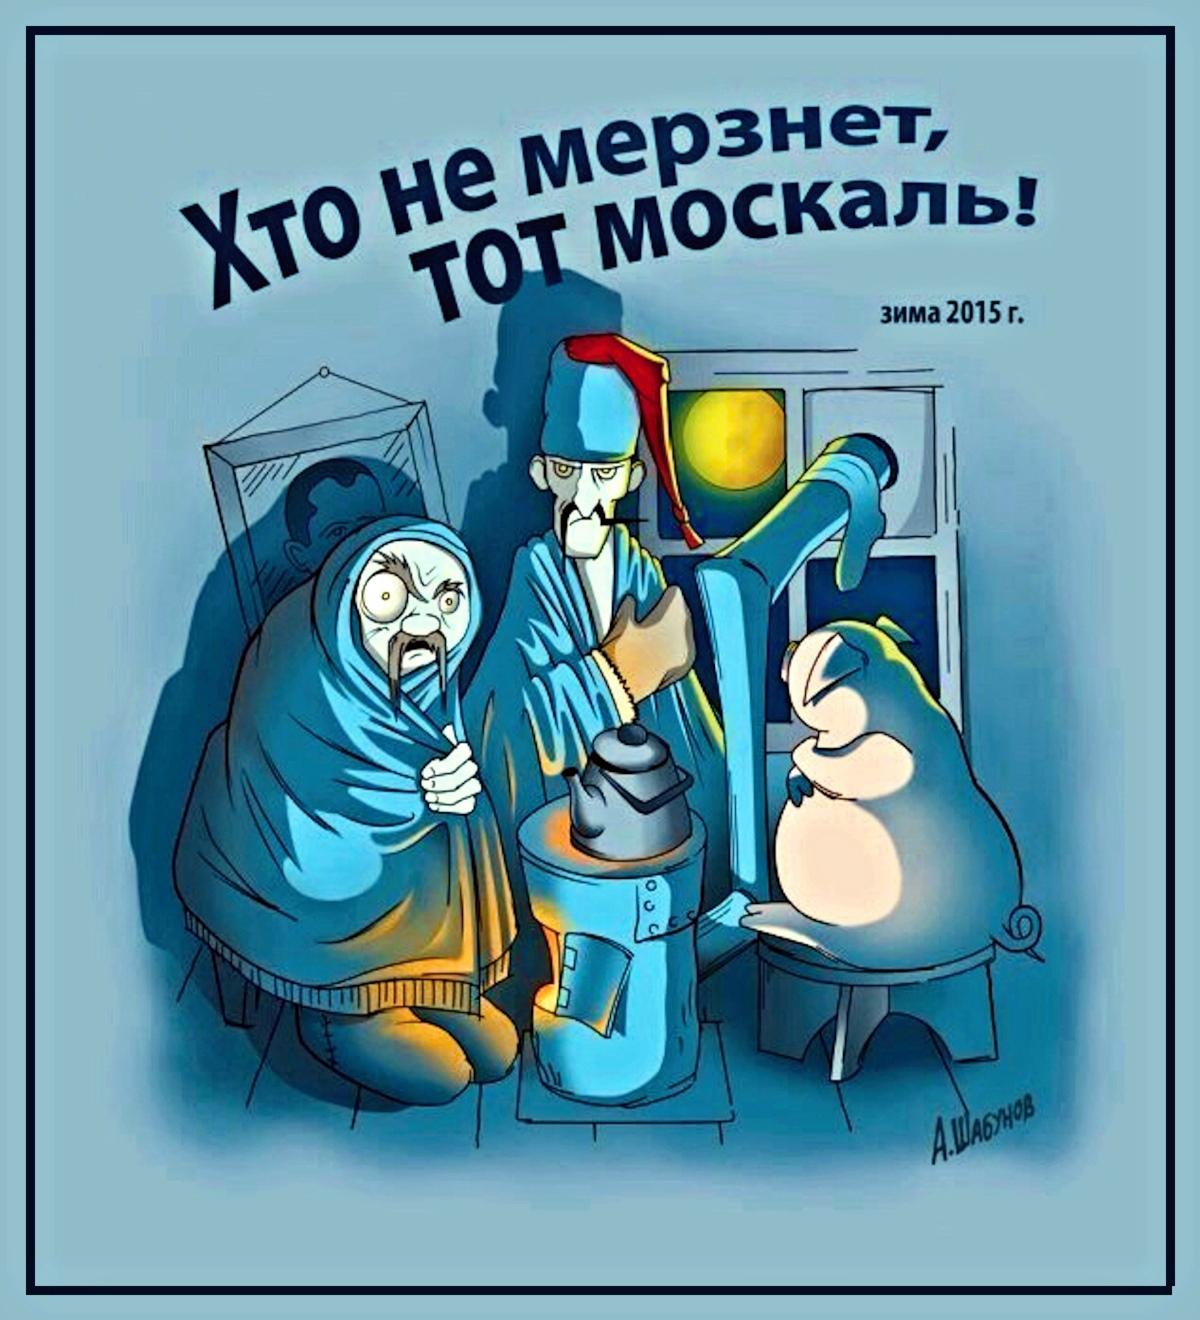 Ukraine declares war on Russian social media and